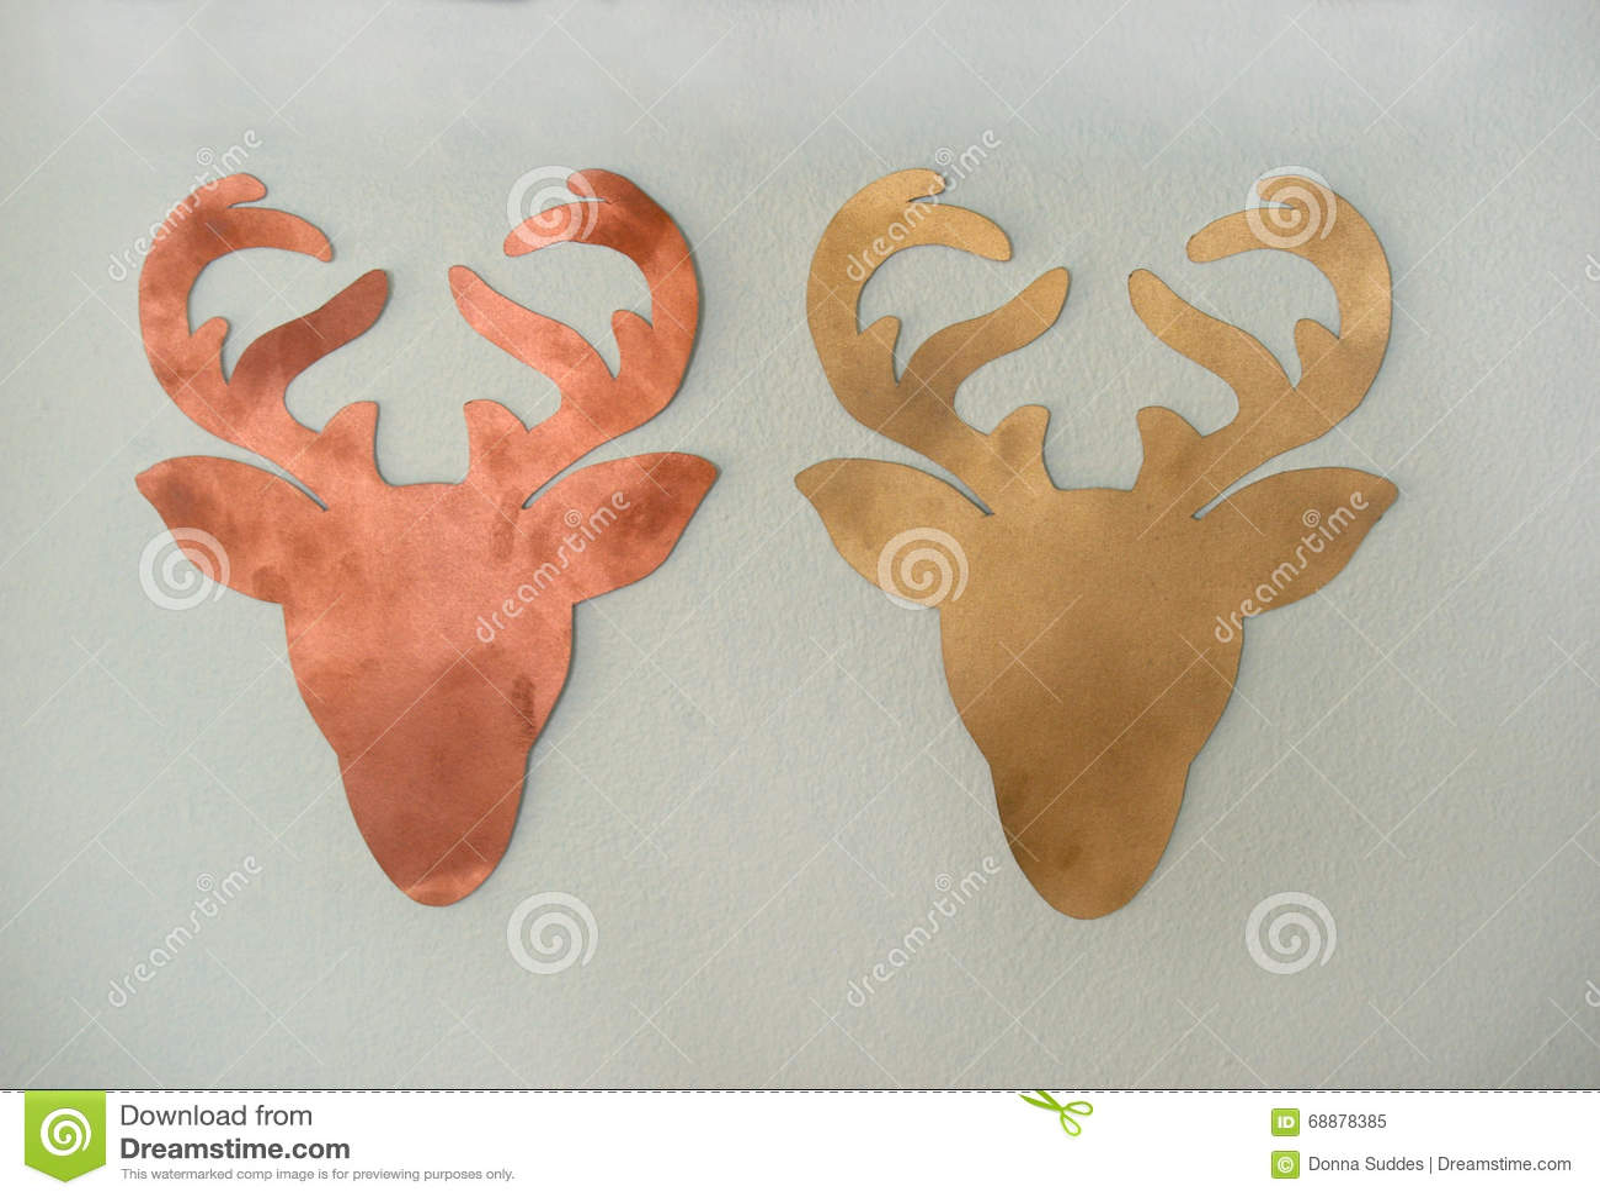 Reindeer cut out card vector illustration cartoondealer for Reindeer template cut out